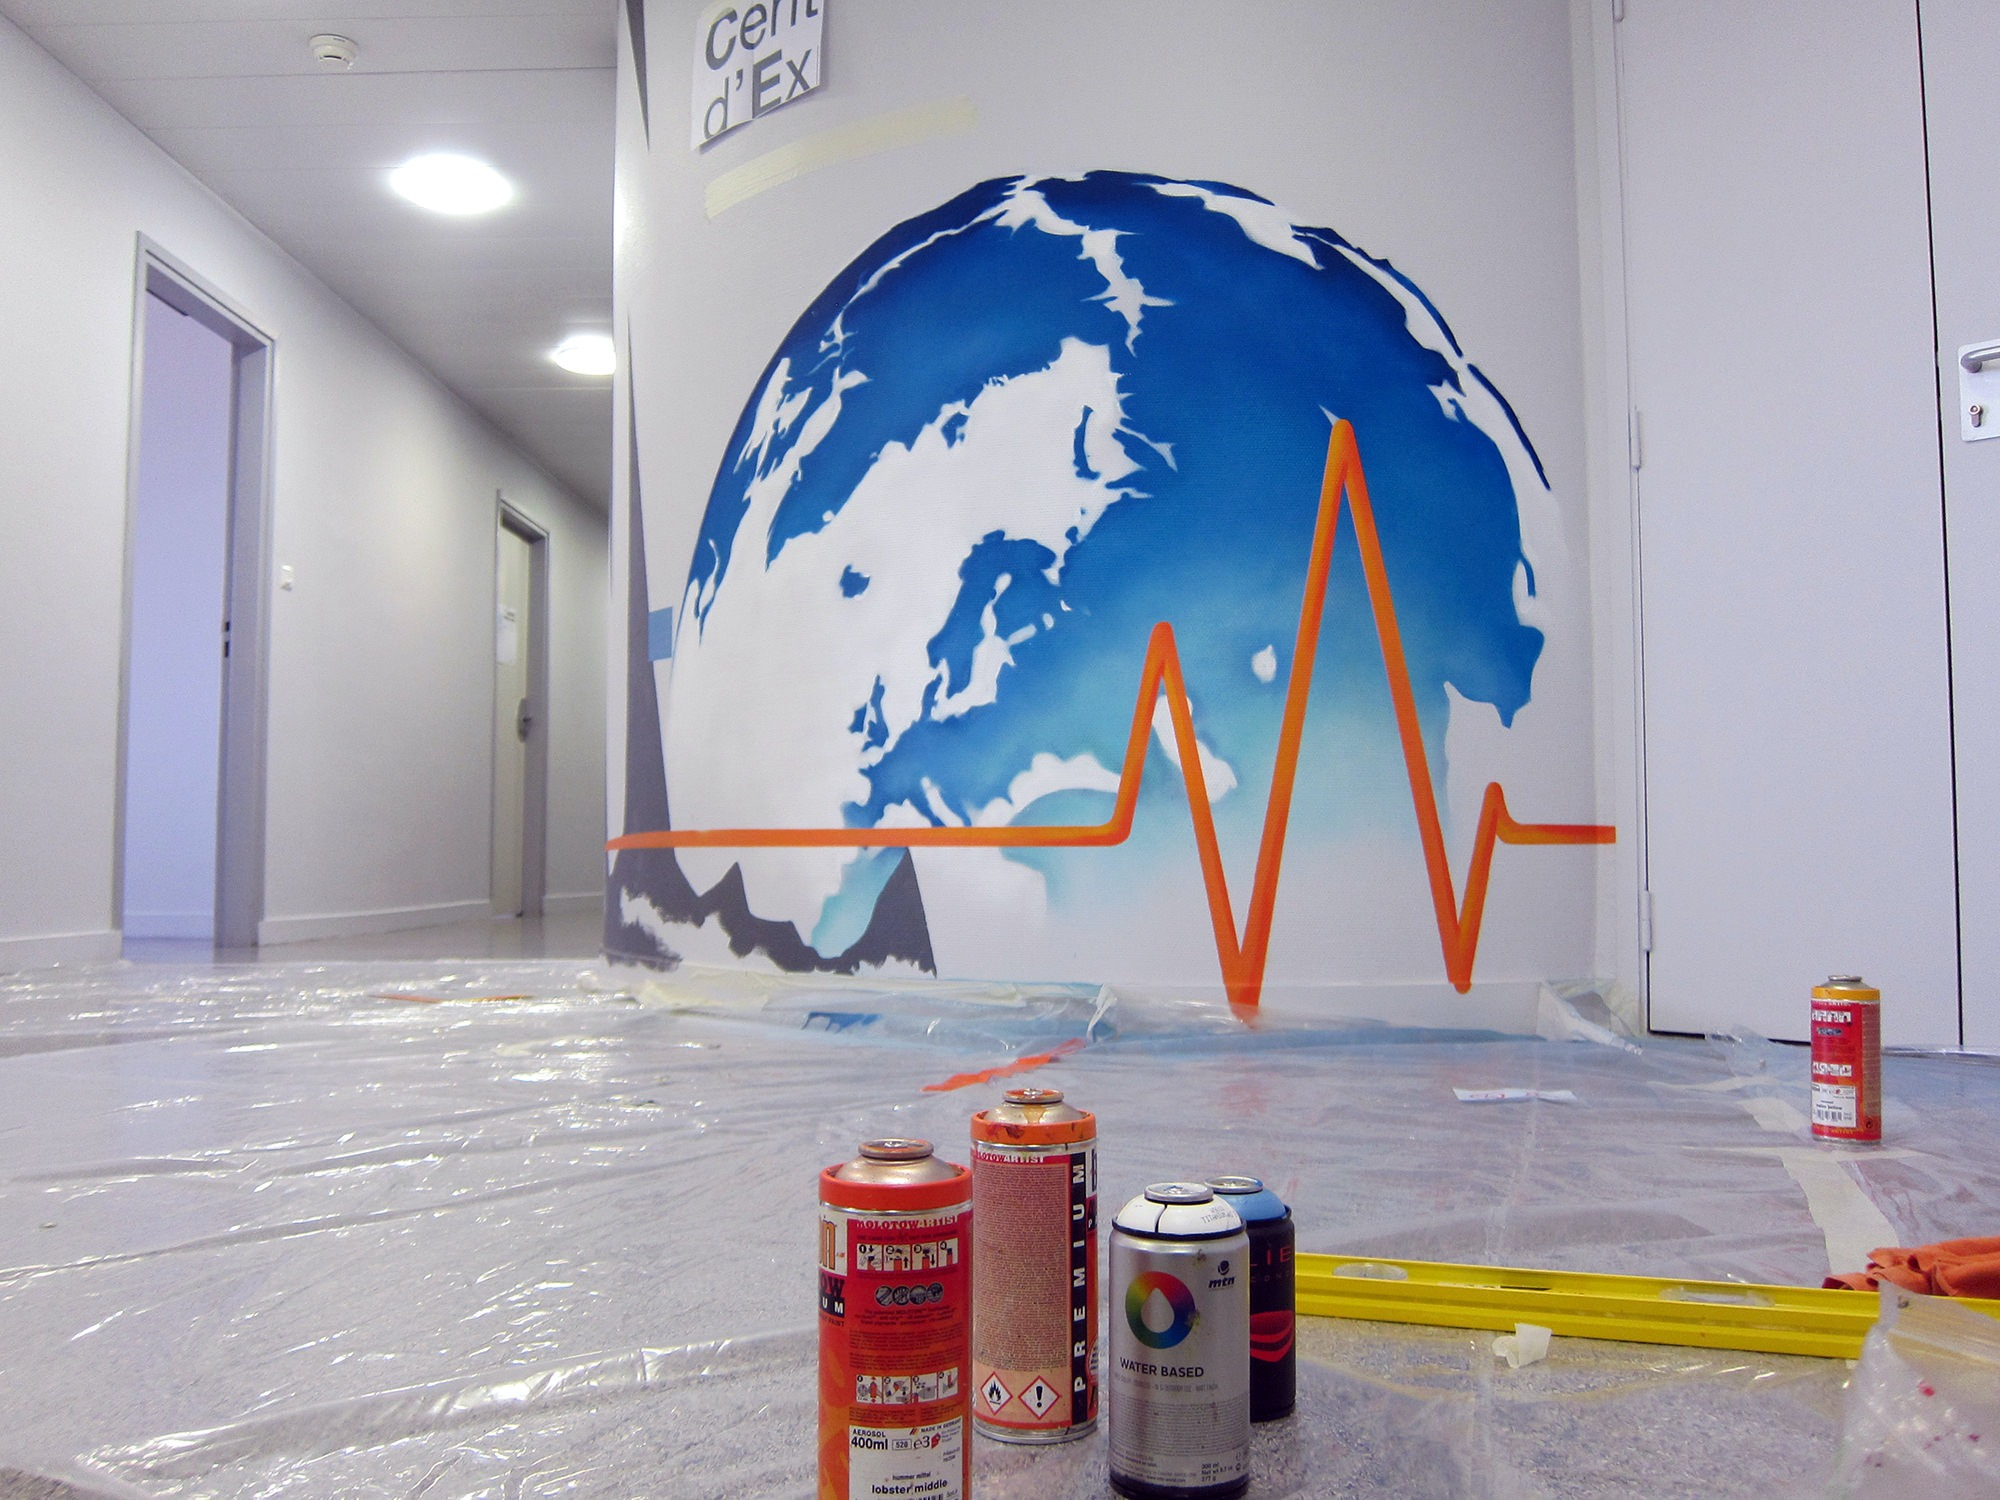 planete-centre-expertise-medical-blagnac-aeroport